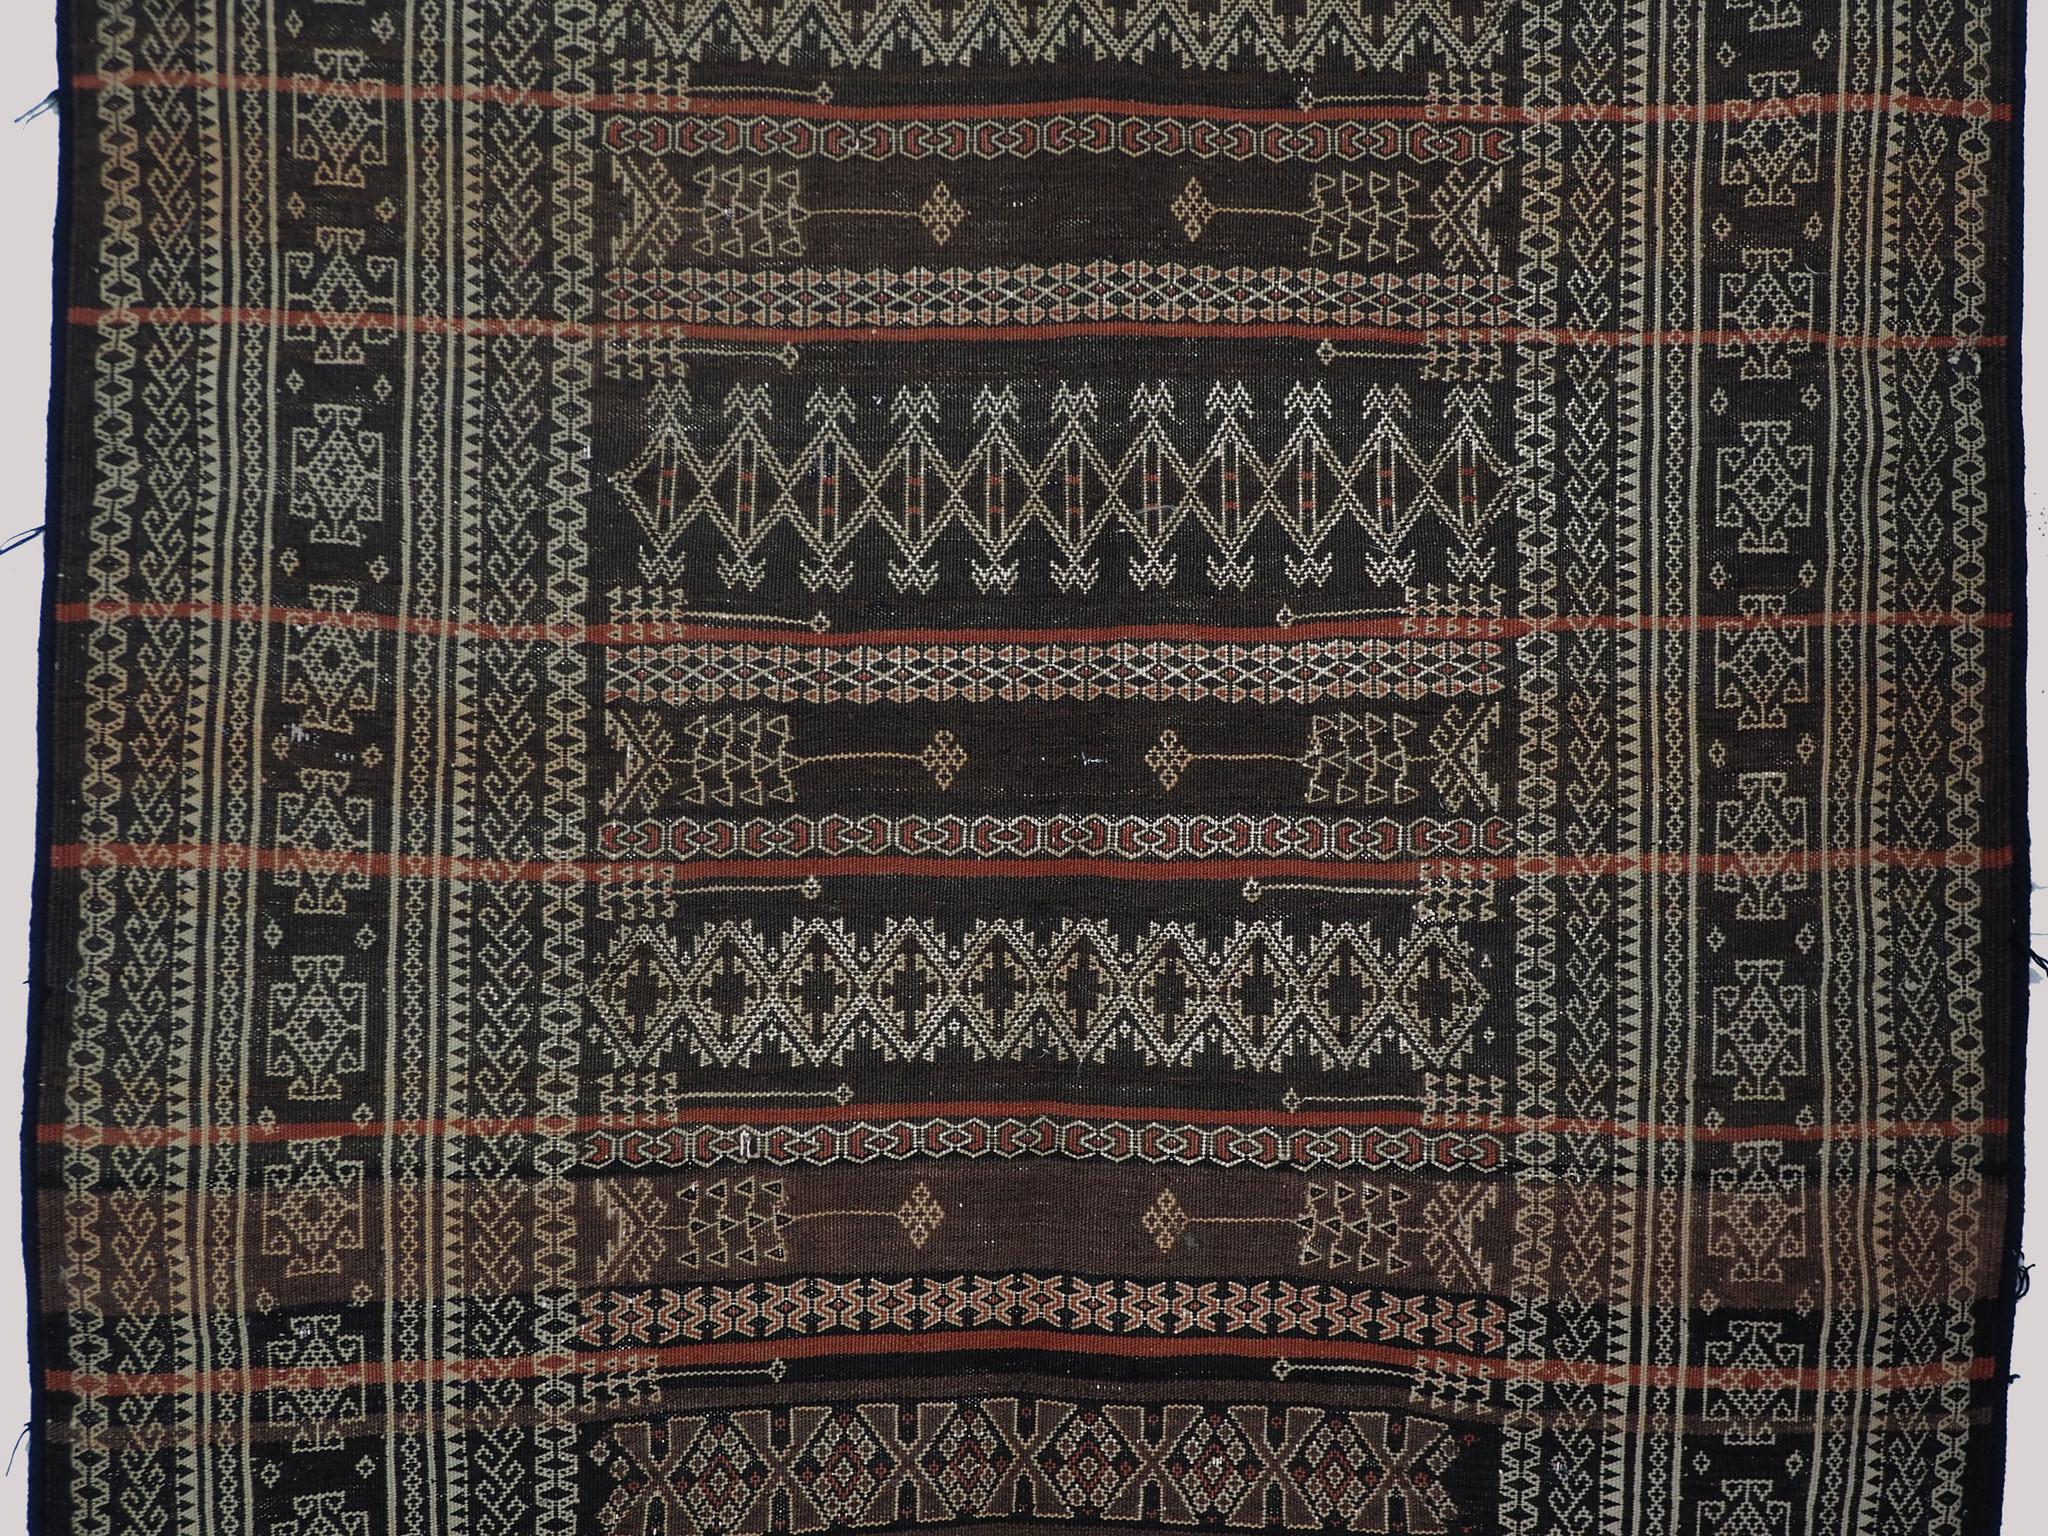 293x124 cm Antik Balouch  kelim afghan Beloch kilim Nr-19/PK-7